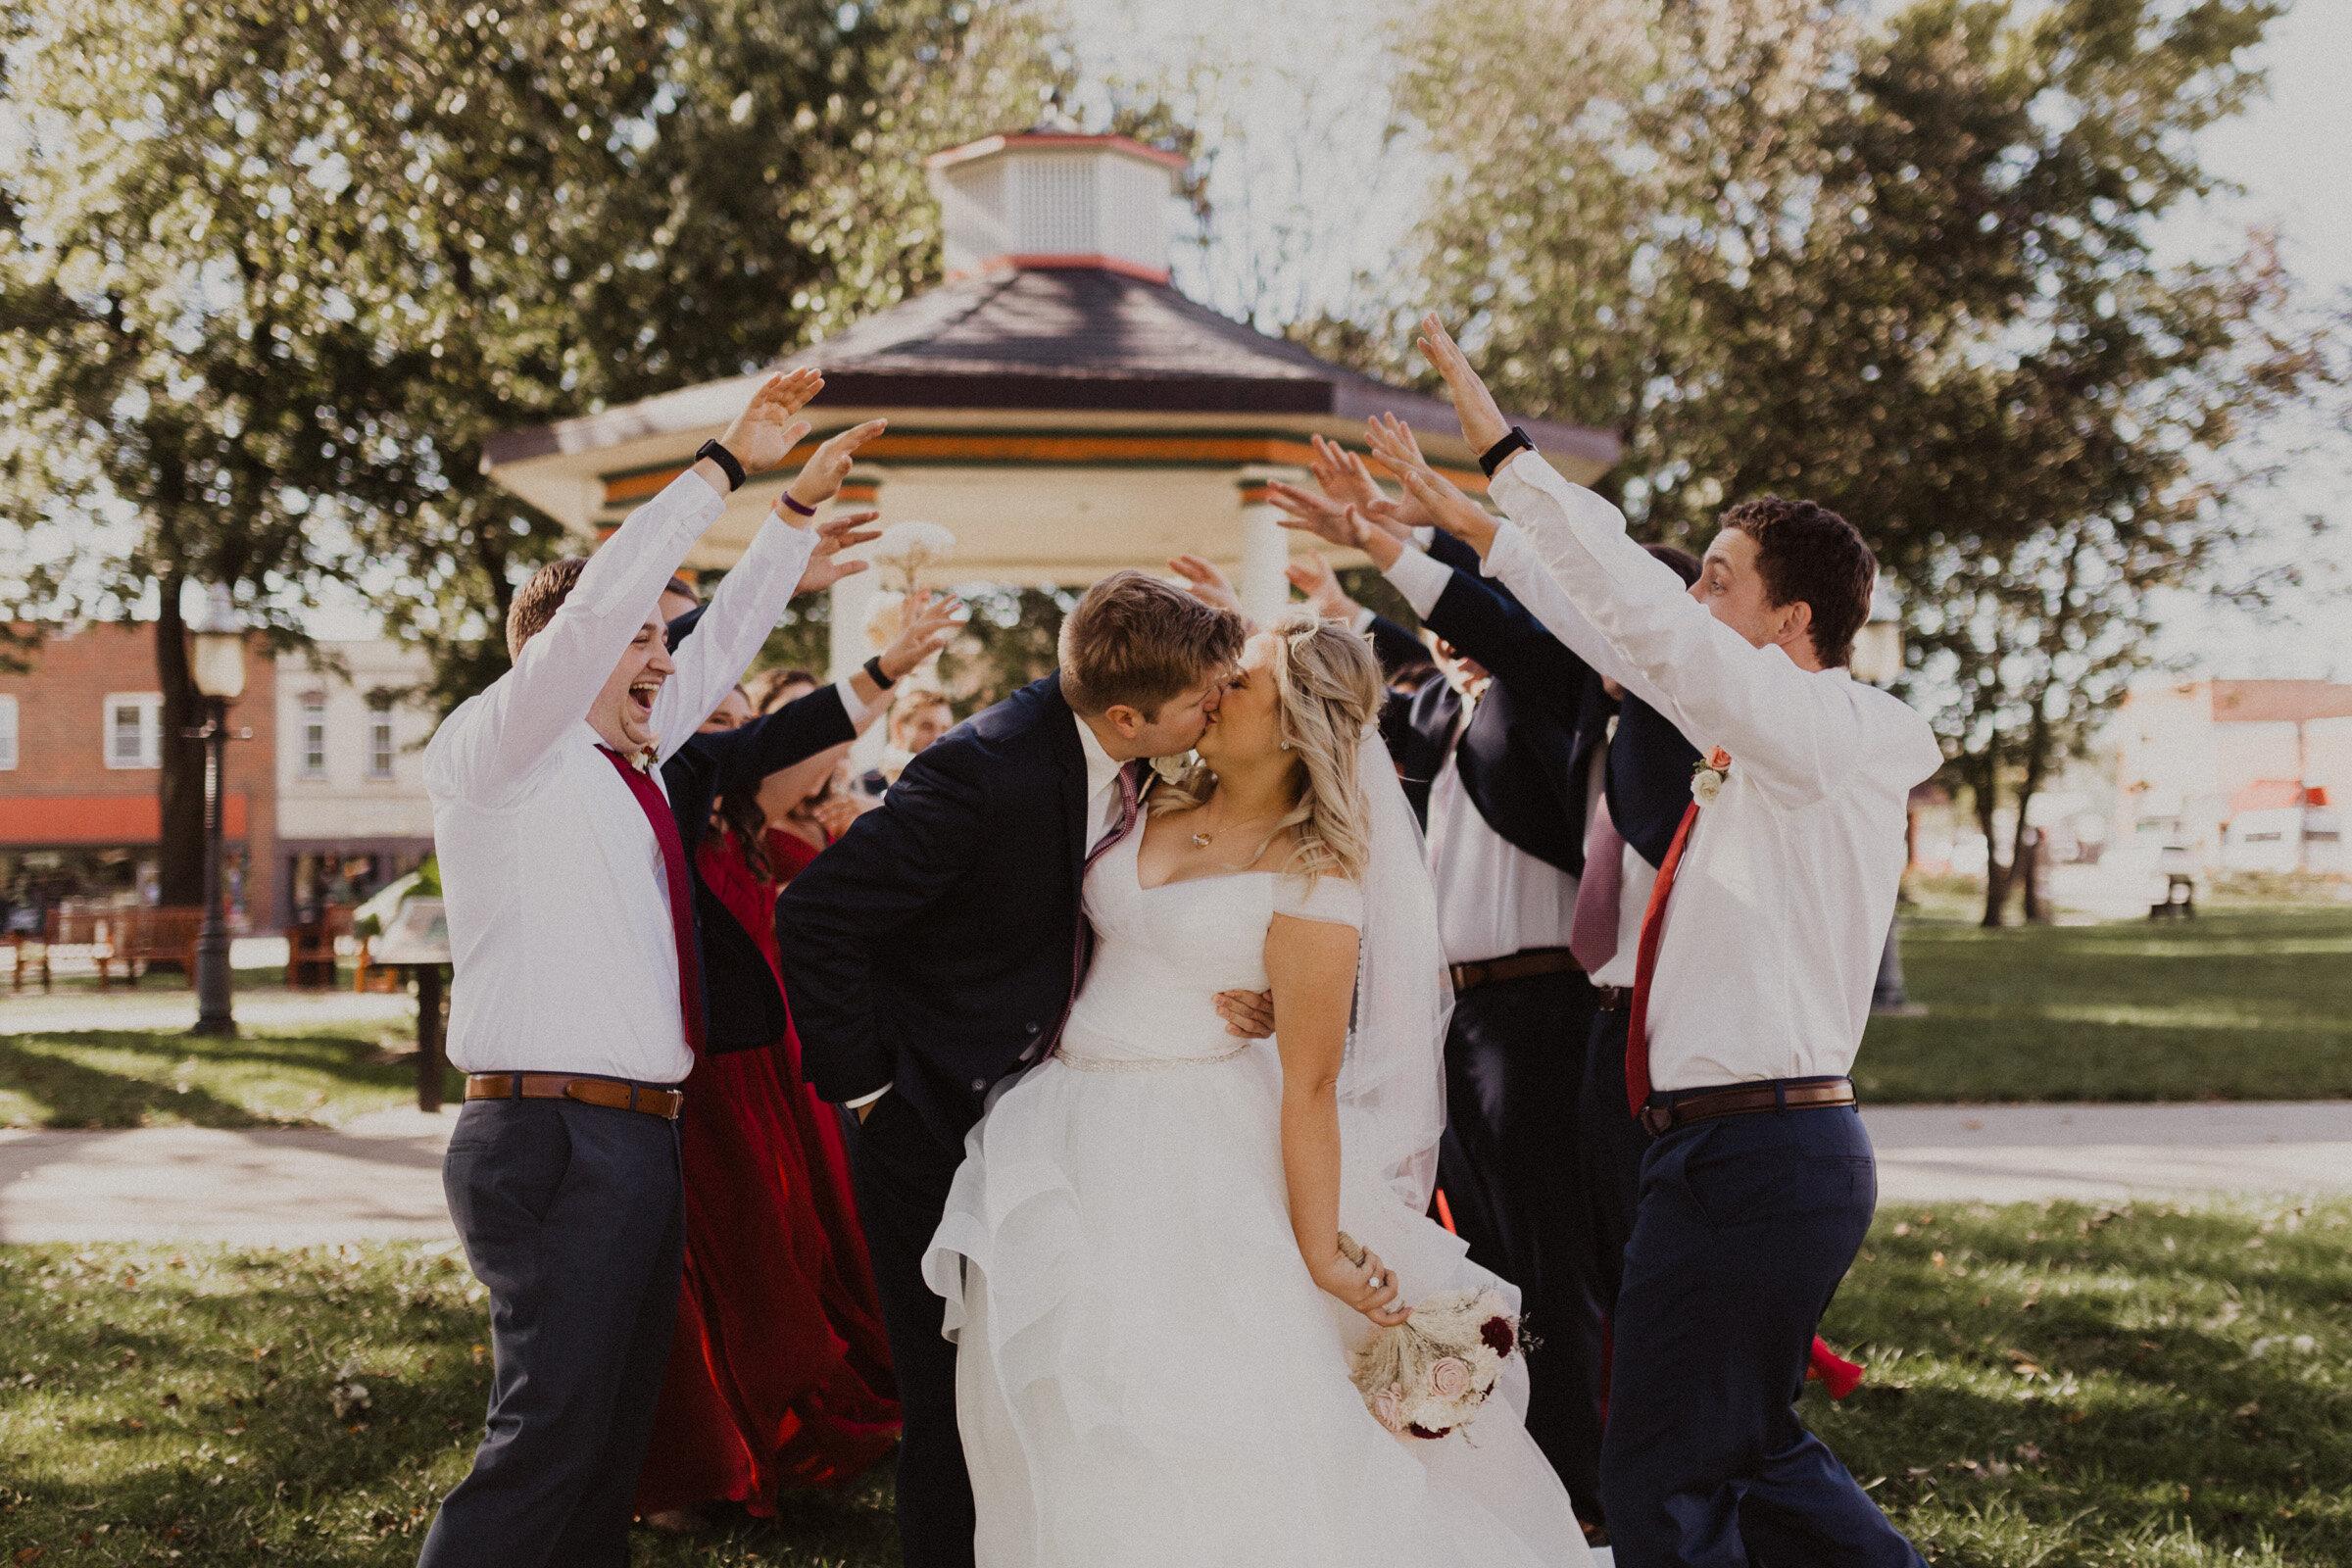 alyssa barletter photography town square paola wedding-13.jpg